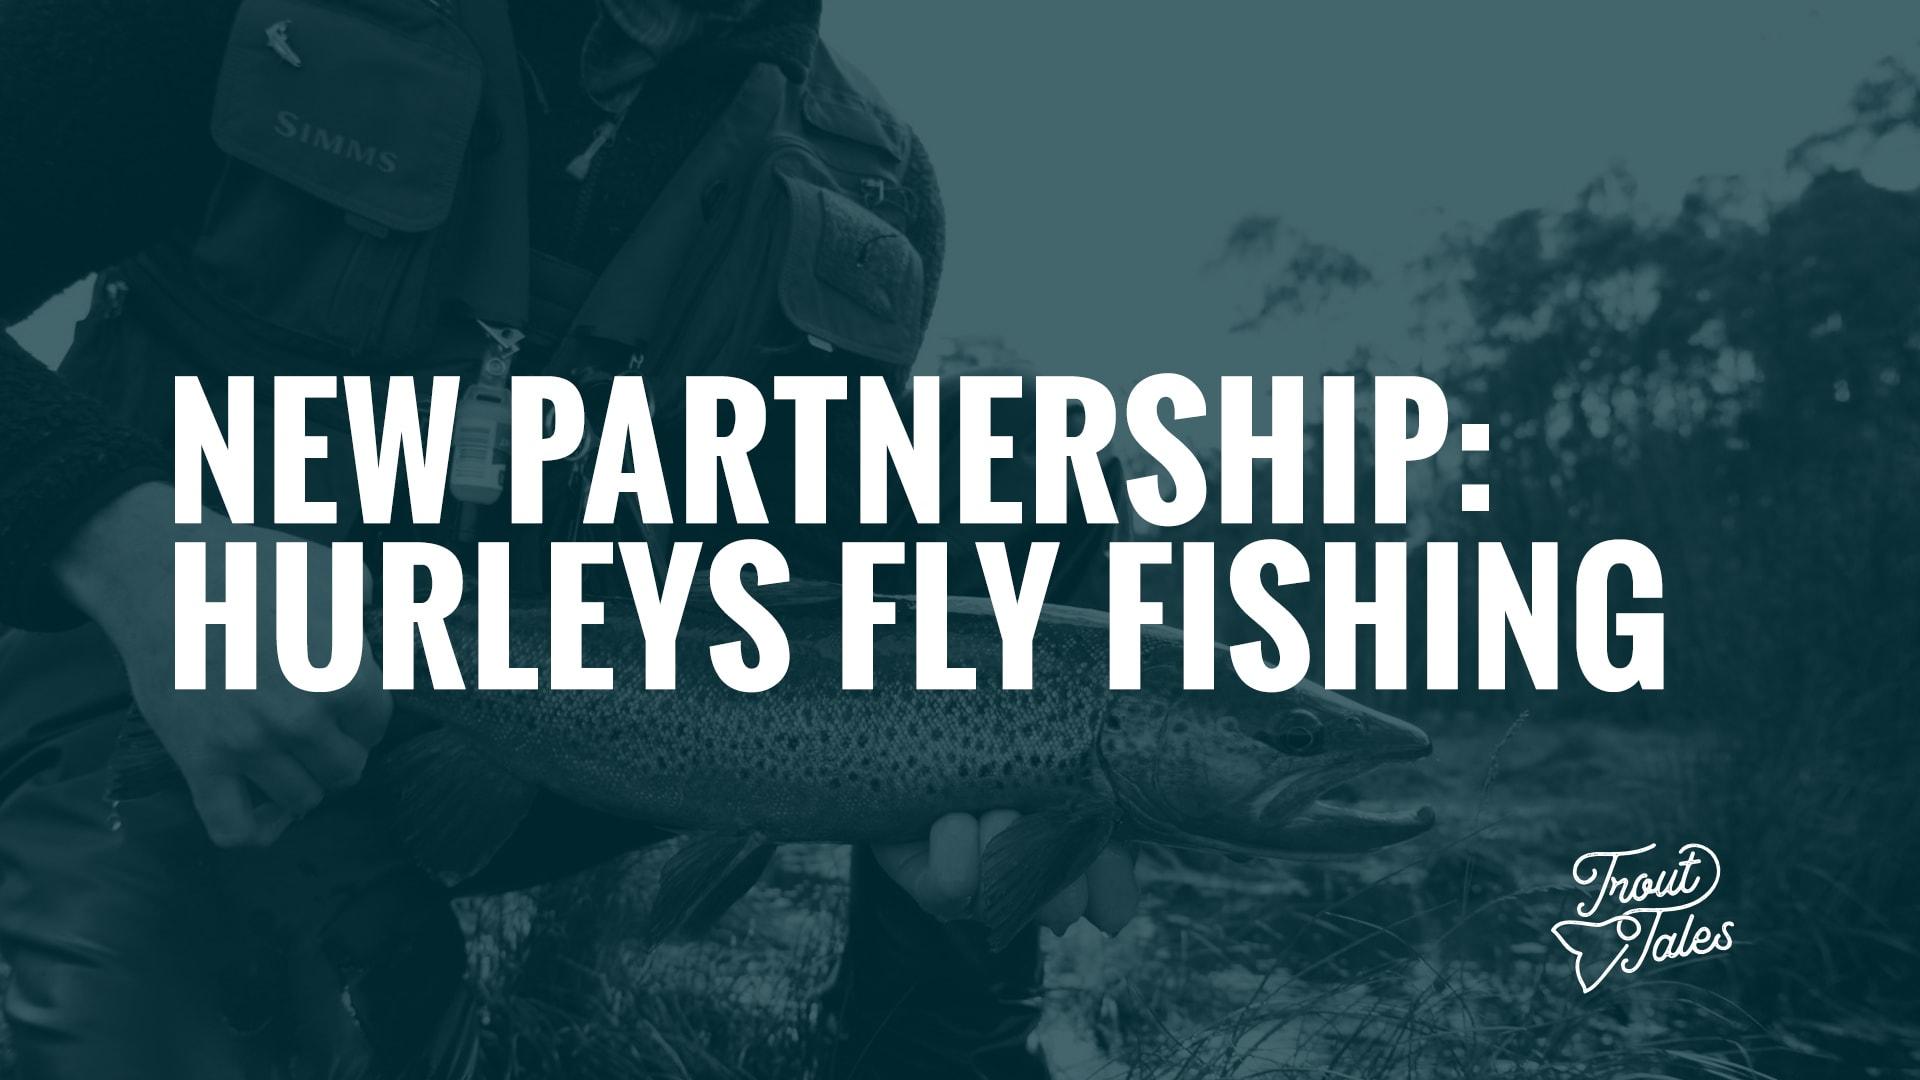 New Partnership: Hurleys Fly Fishing